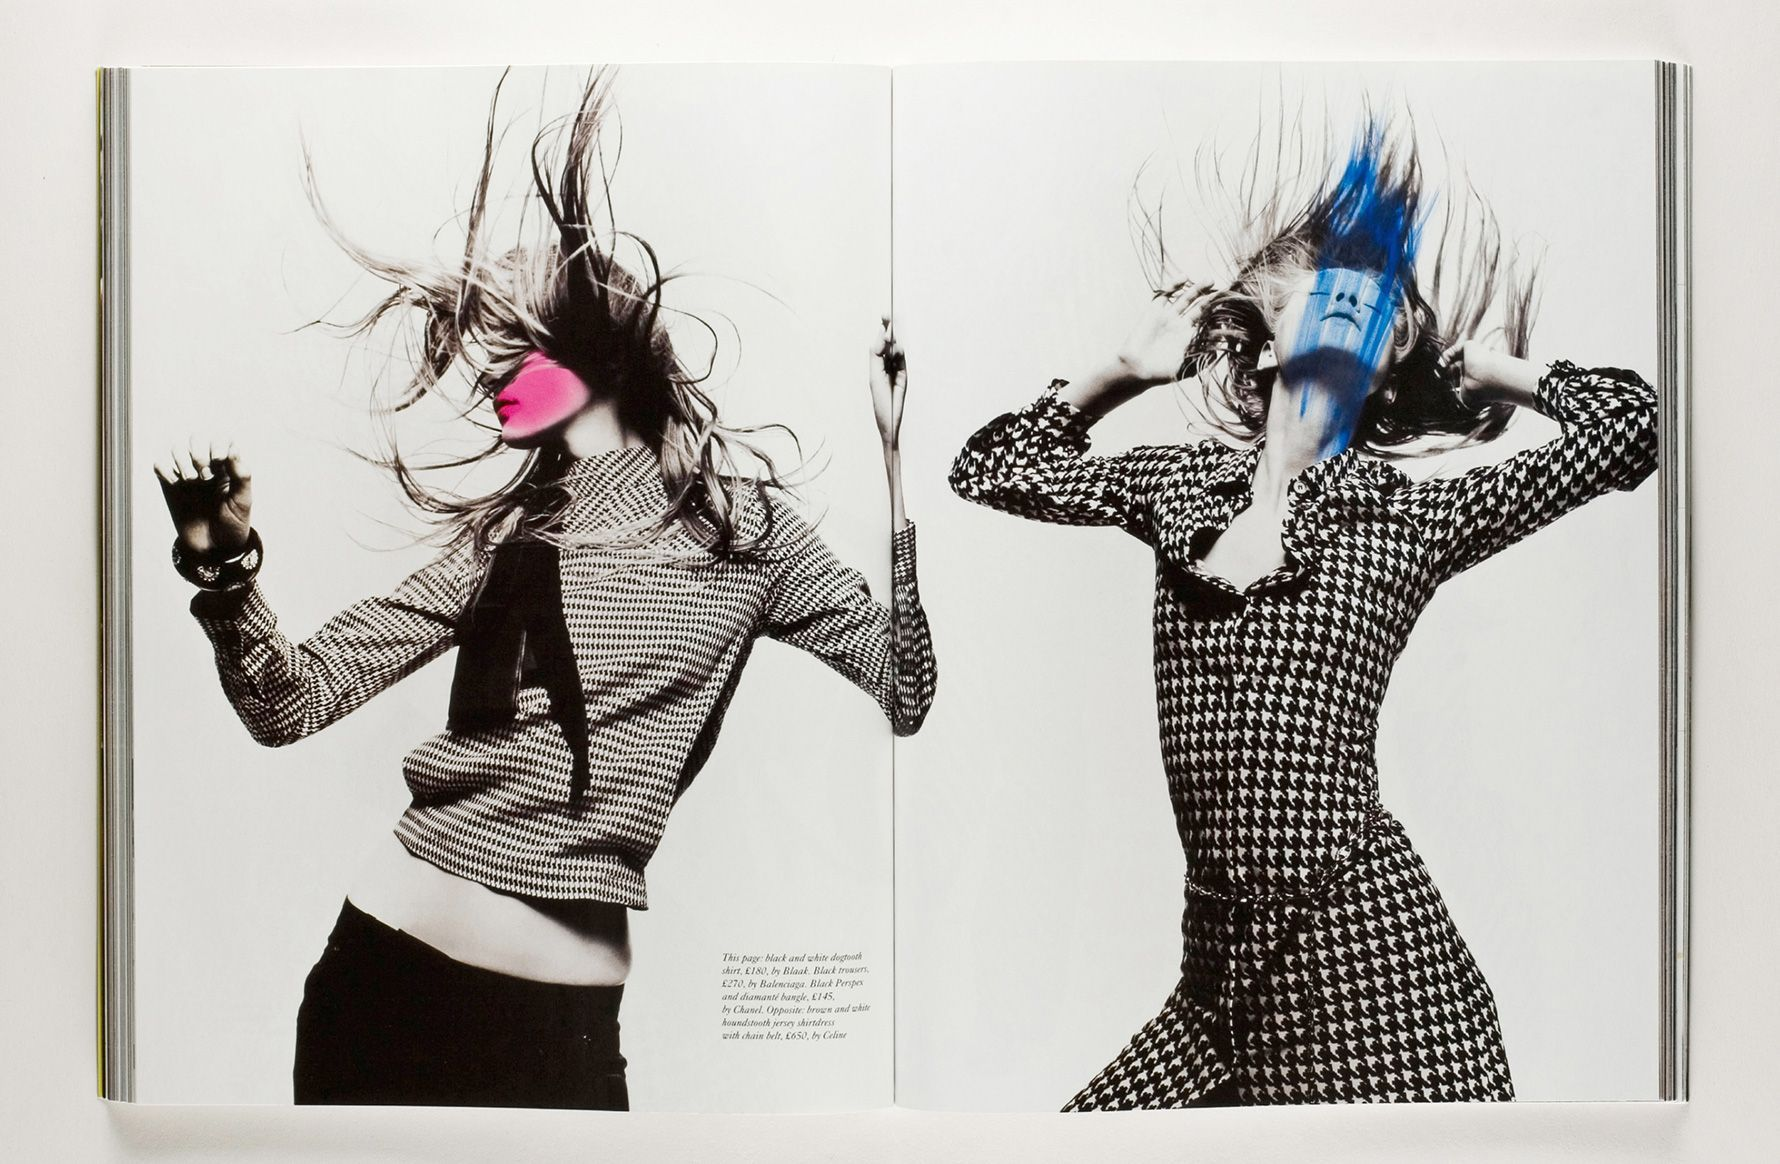 Erika Wall shot by Sølve Sundsbø for The Fashion No 1 | Stylist Karina Givargisoff | MP CREATIVE